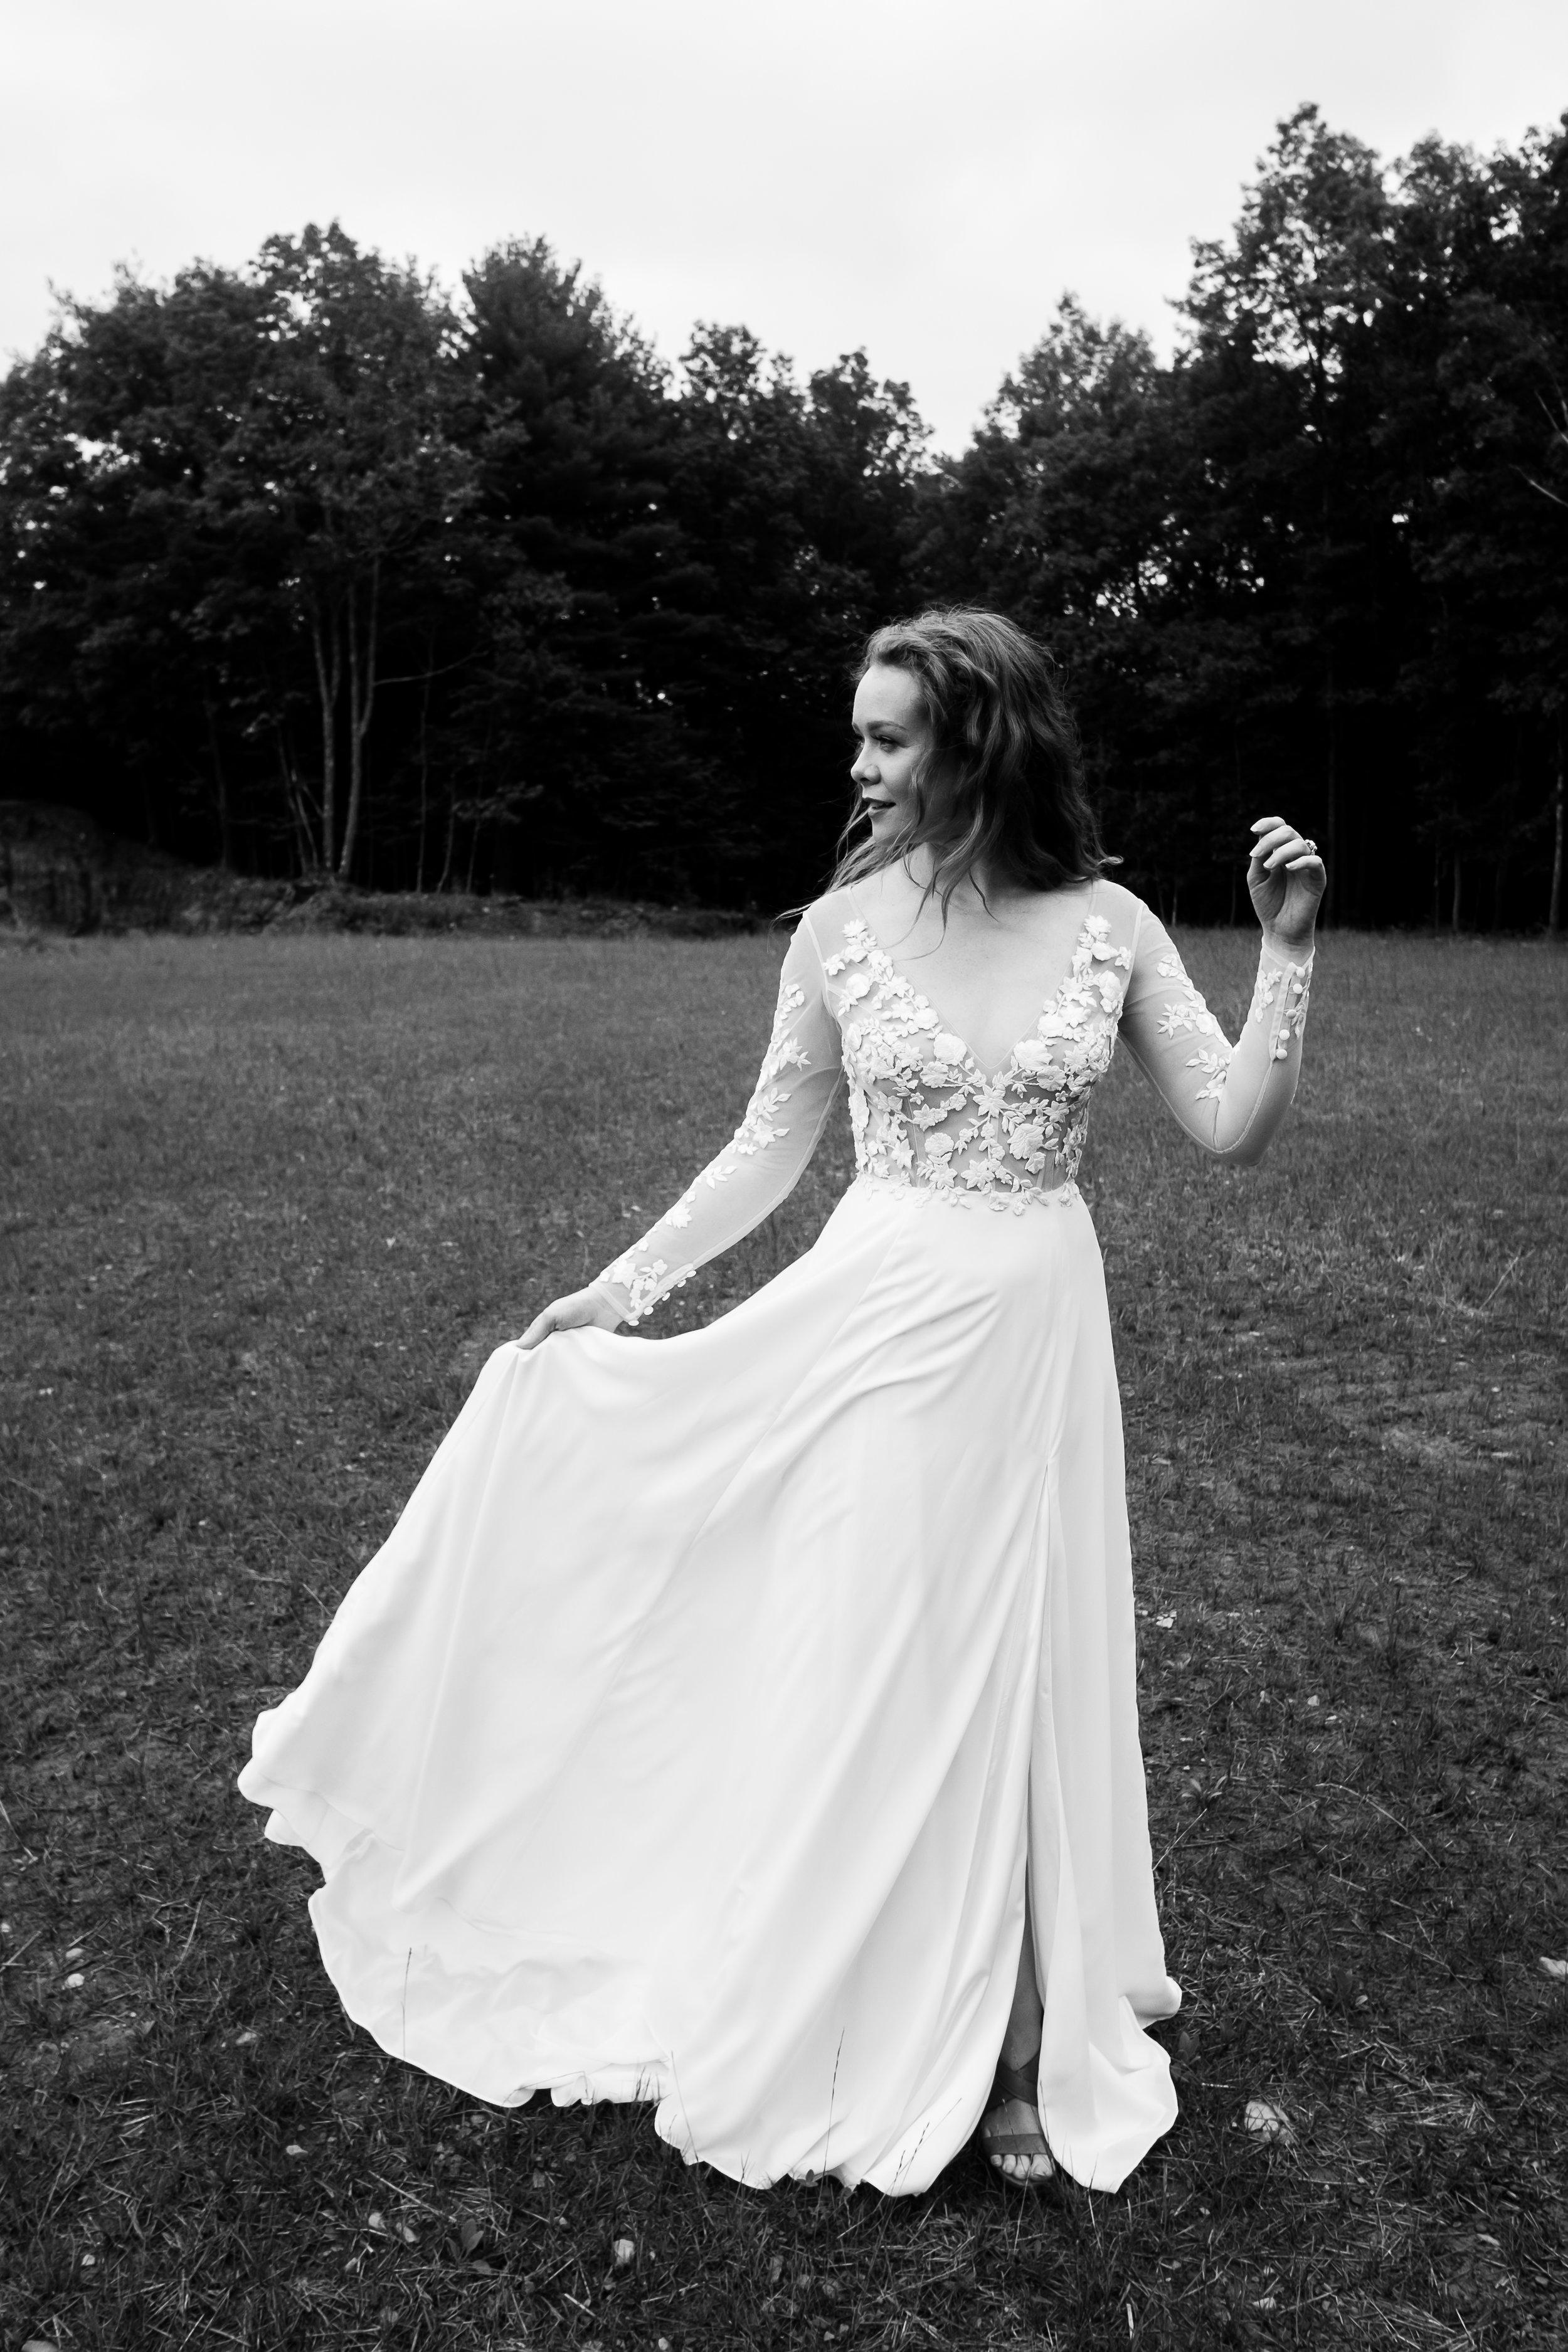 WSPCo-Gather-Greene-Rebecca-Schoneveld-Bridal-388 copy.jpg